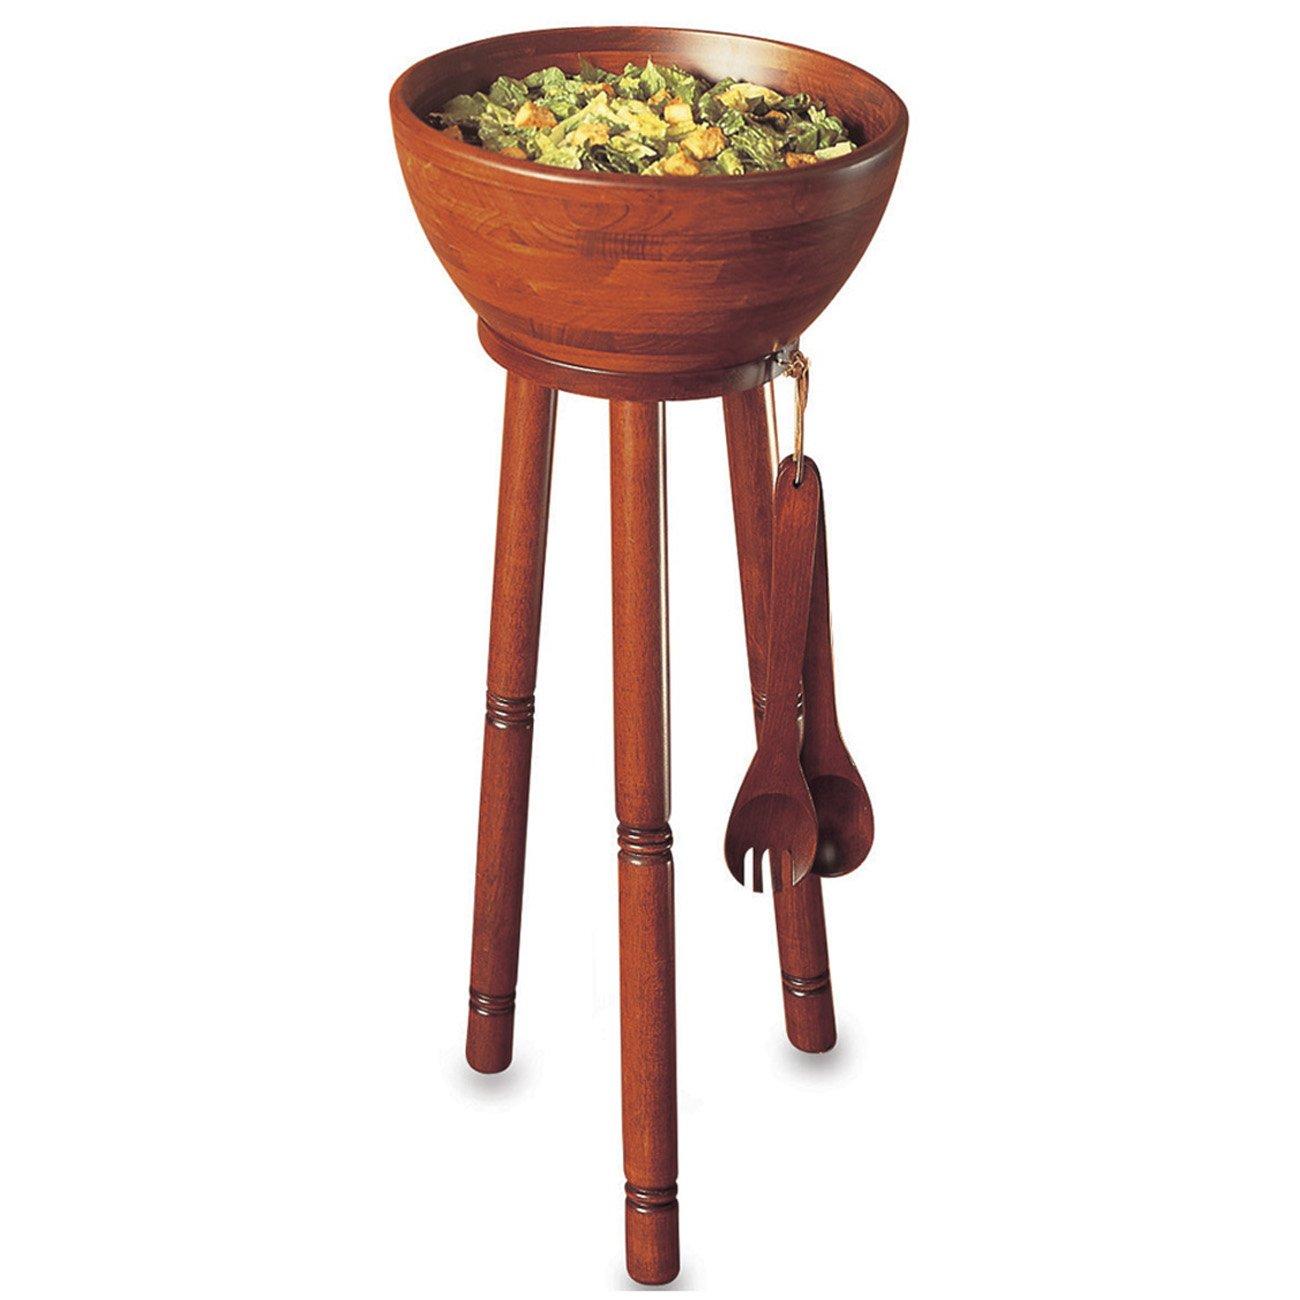 Woodard & Charles WC560-3 Stand & Salad Bowl Set, Cherry